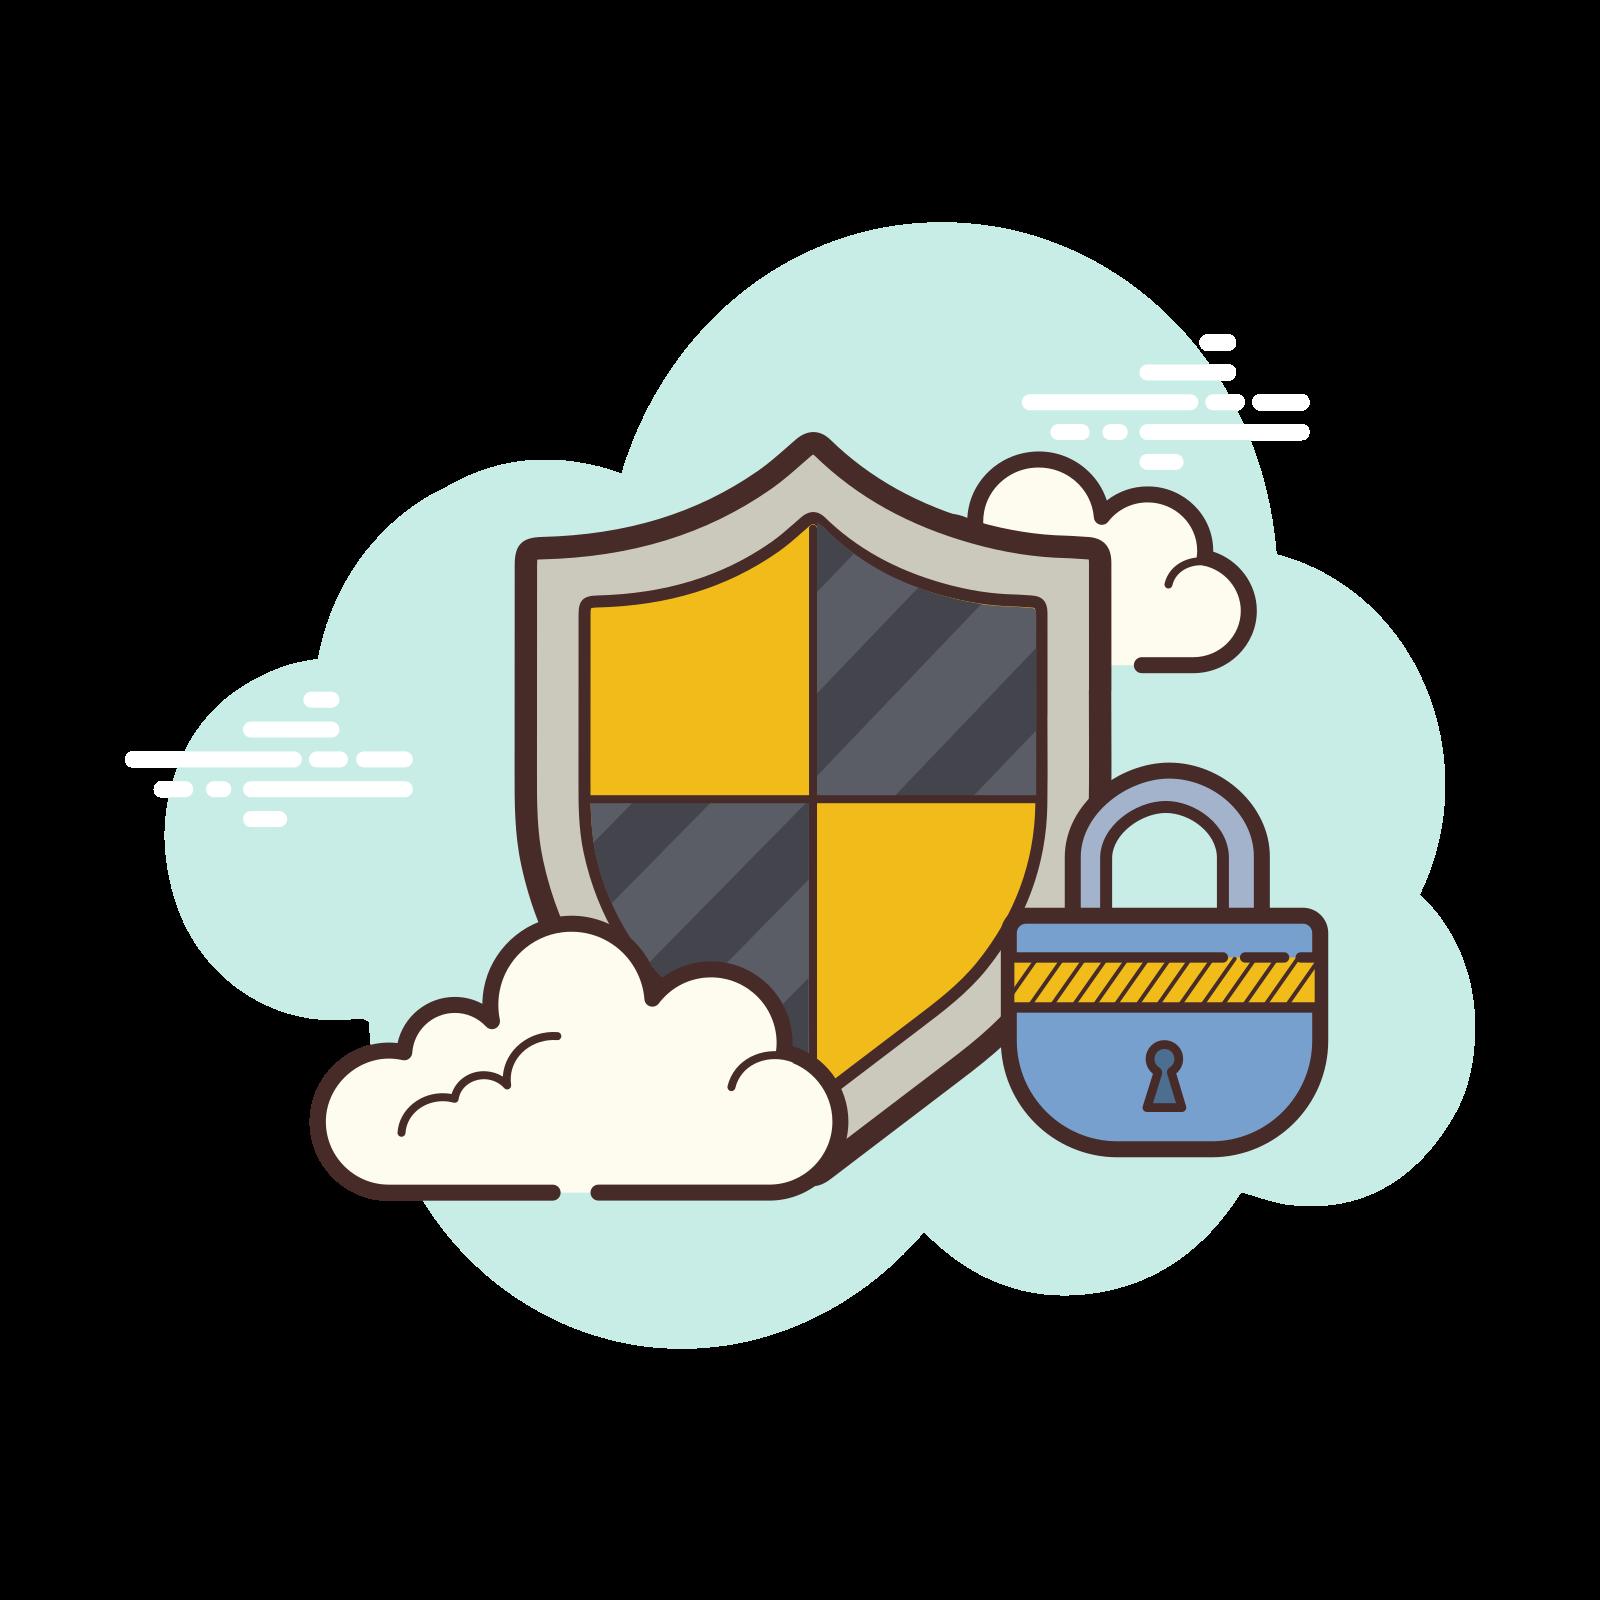 Security Lock Yellow icon